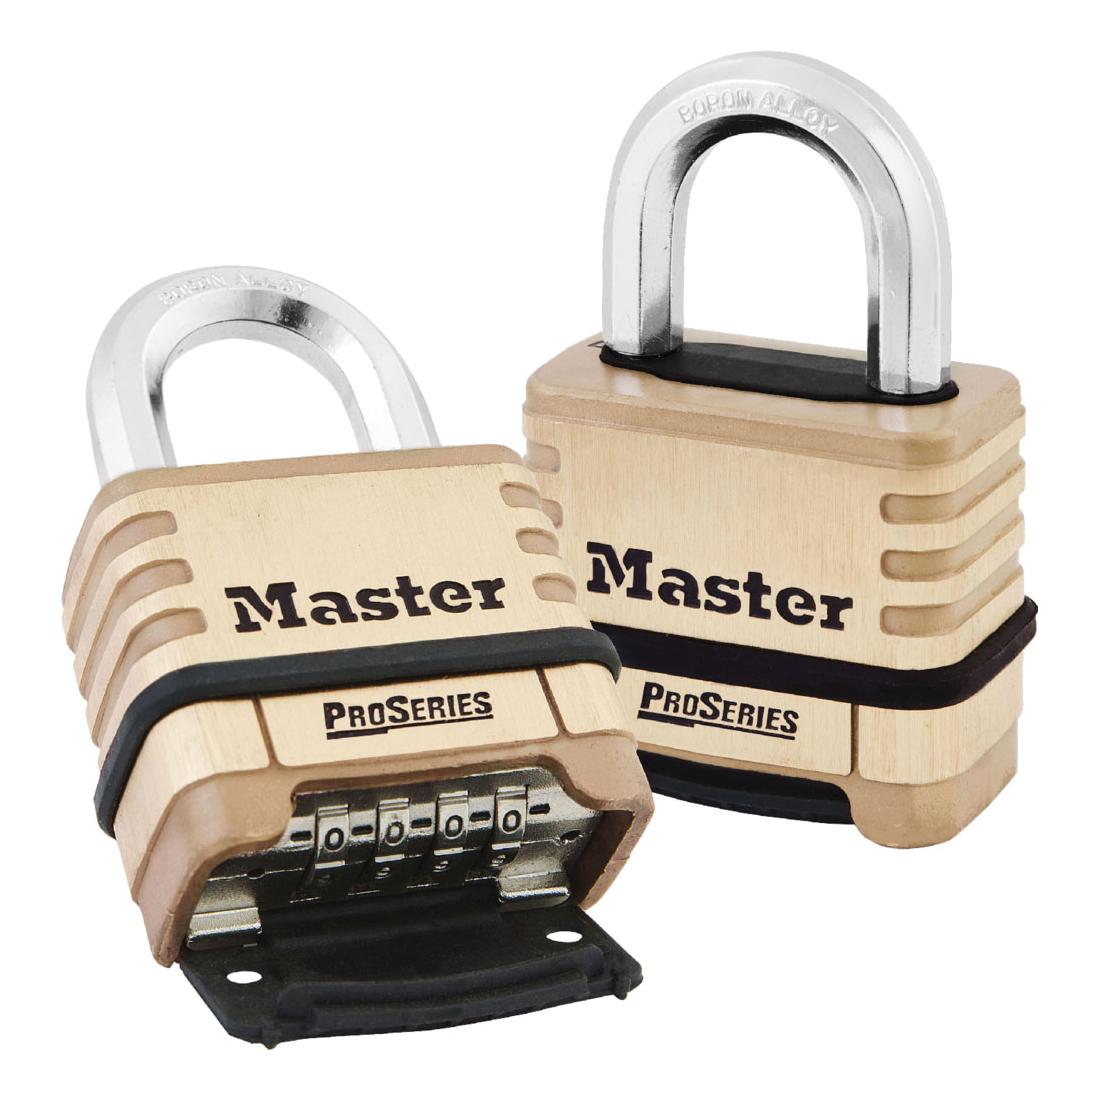 Master Lock® 1175 ProSeries® Resettable Safety Padlock, 3/8 in Shackle, Solid Brass Body, Brass, Deadbolt Locking Locking